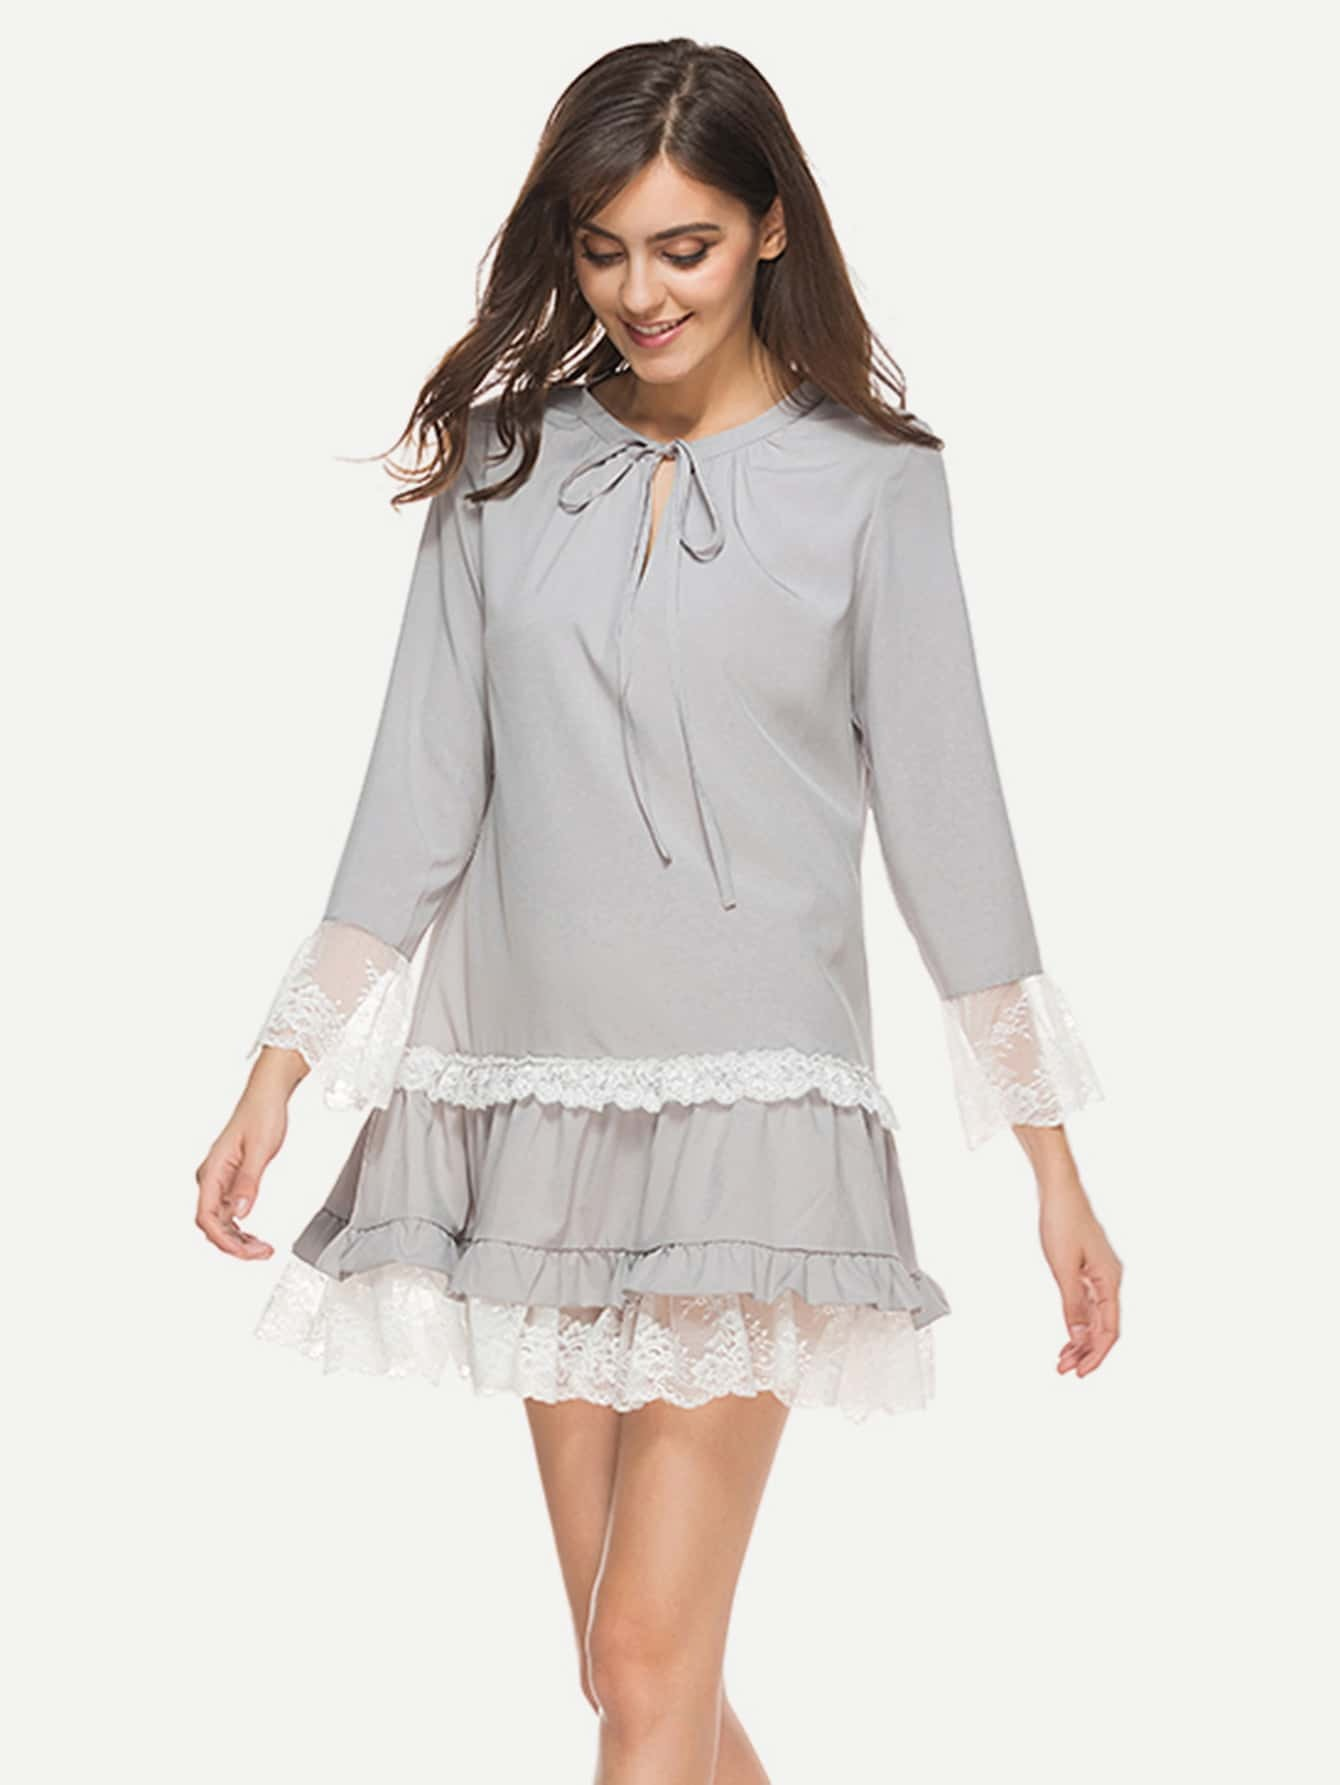 Contrast Lace Trim Tie Neck Frill Hem Dress maison jules new junior s small s pink combo lace crepe contrast trim dress $89